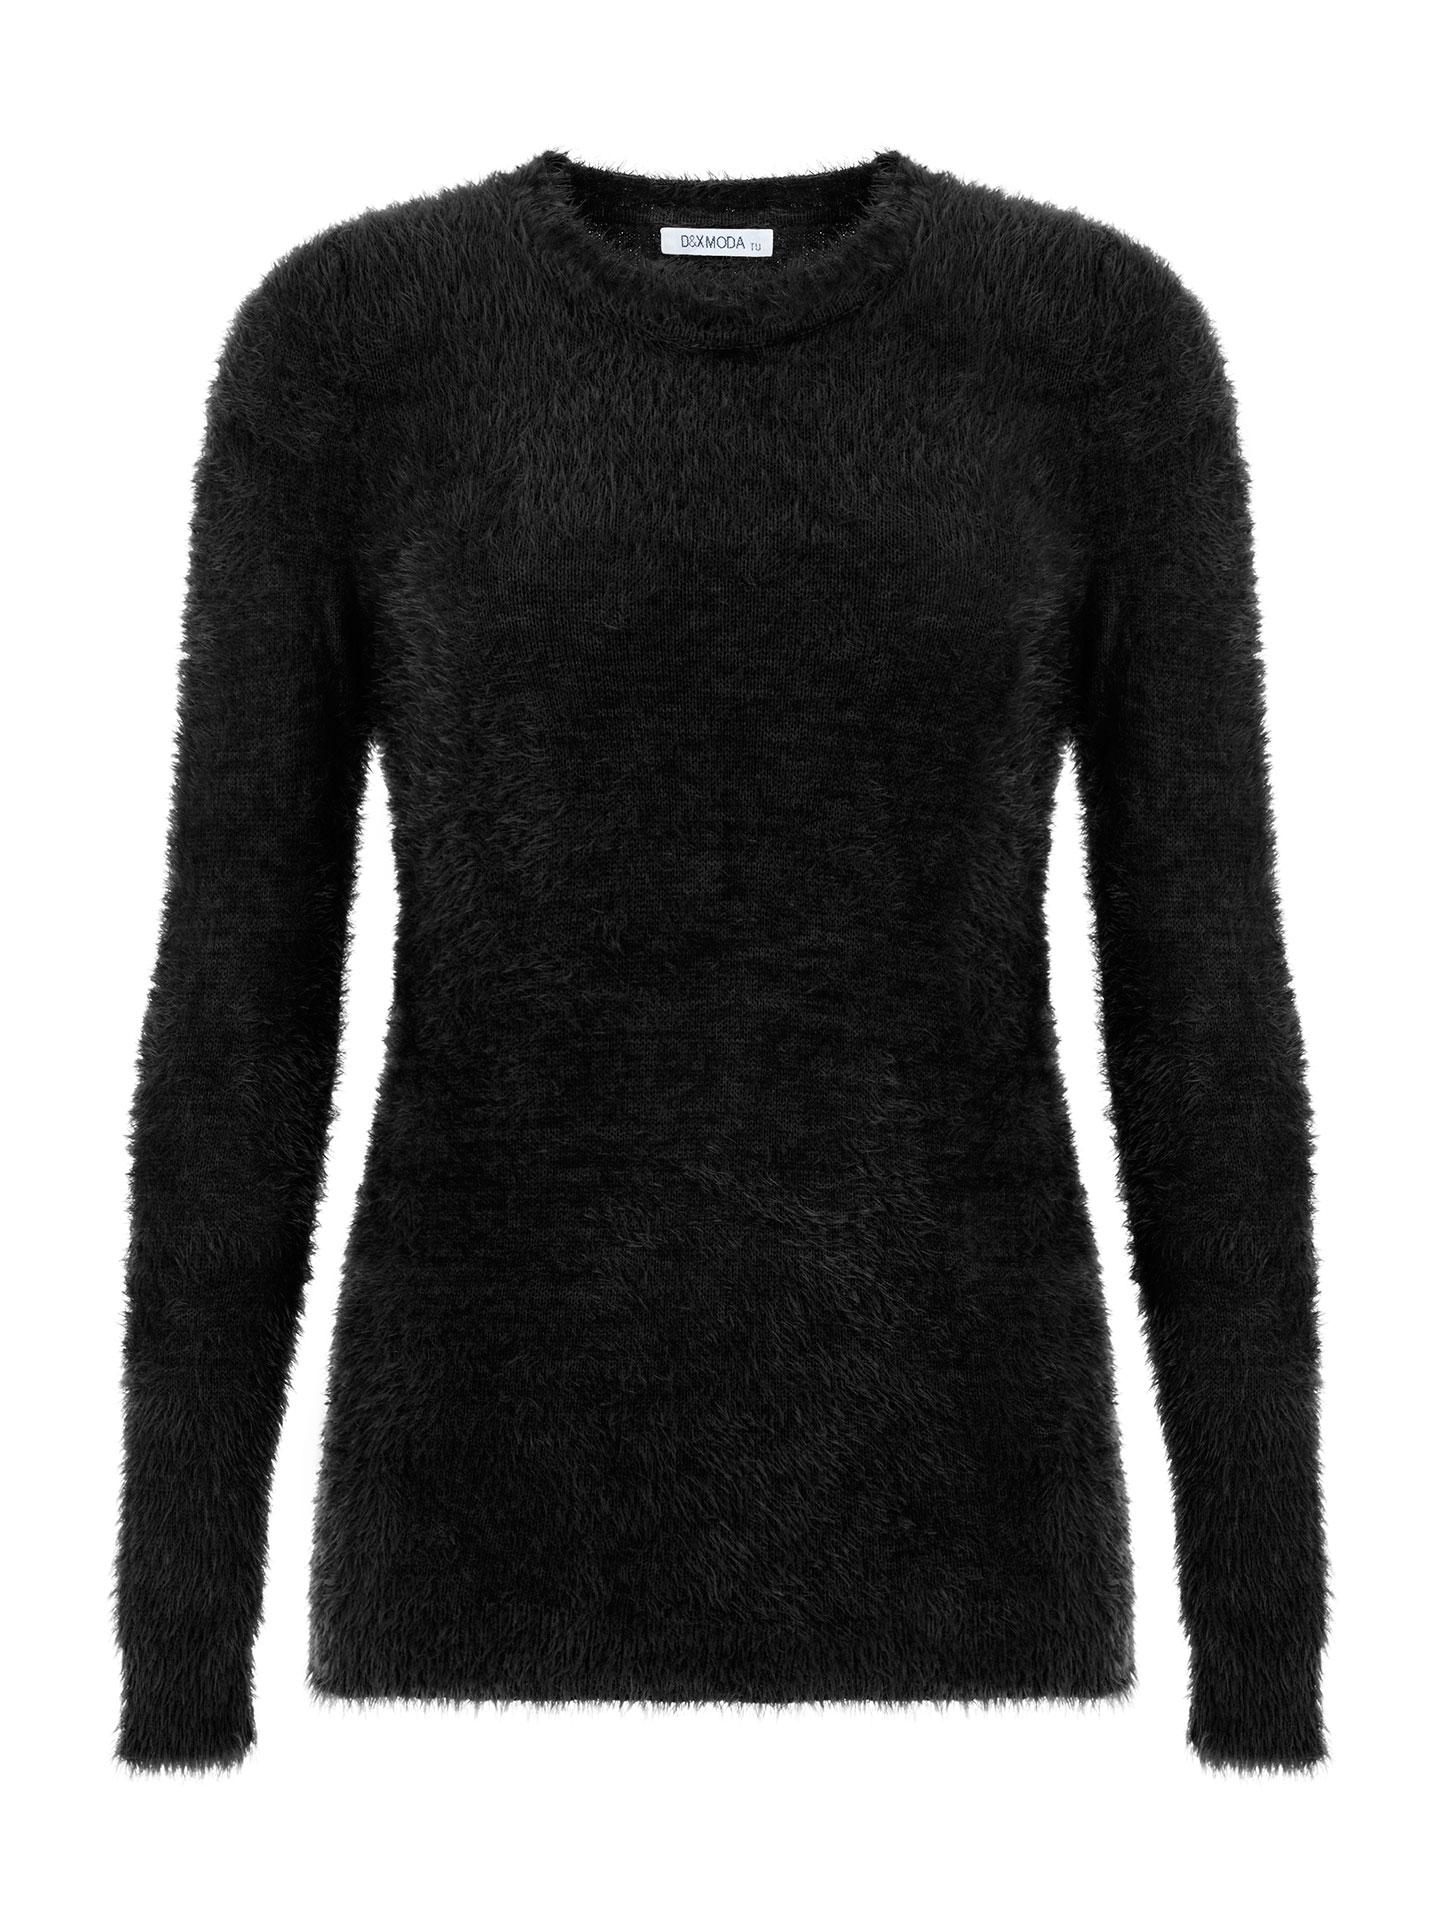 e5367b750f14 Χνουδωτό πουλόβερ σε μαυρο